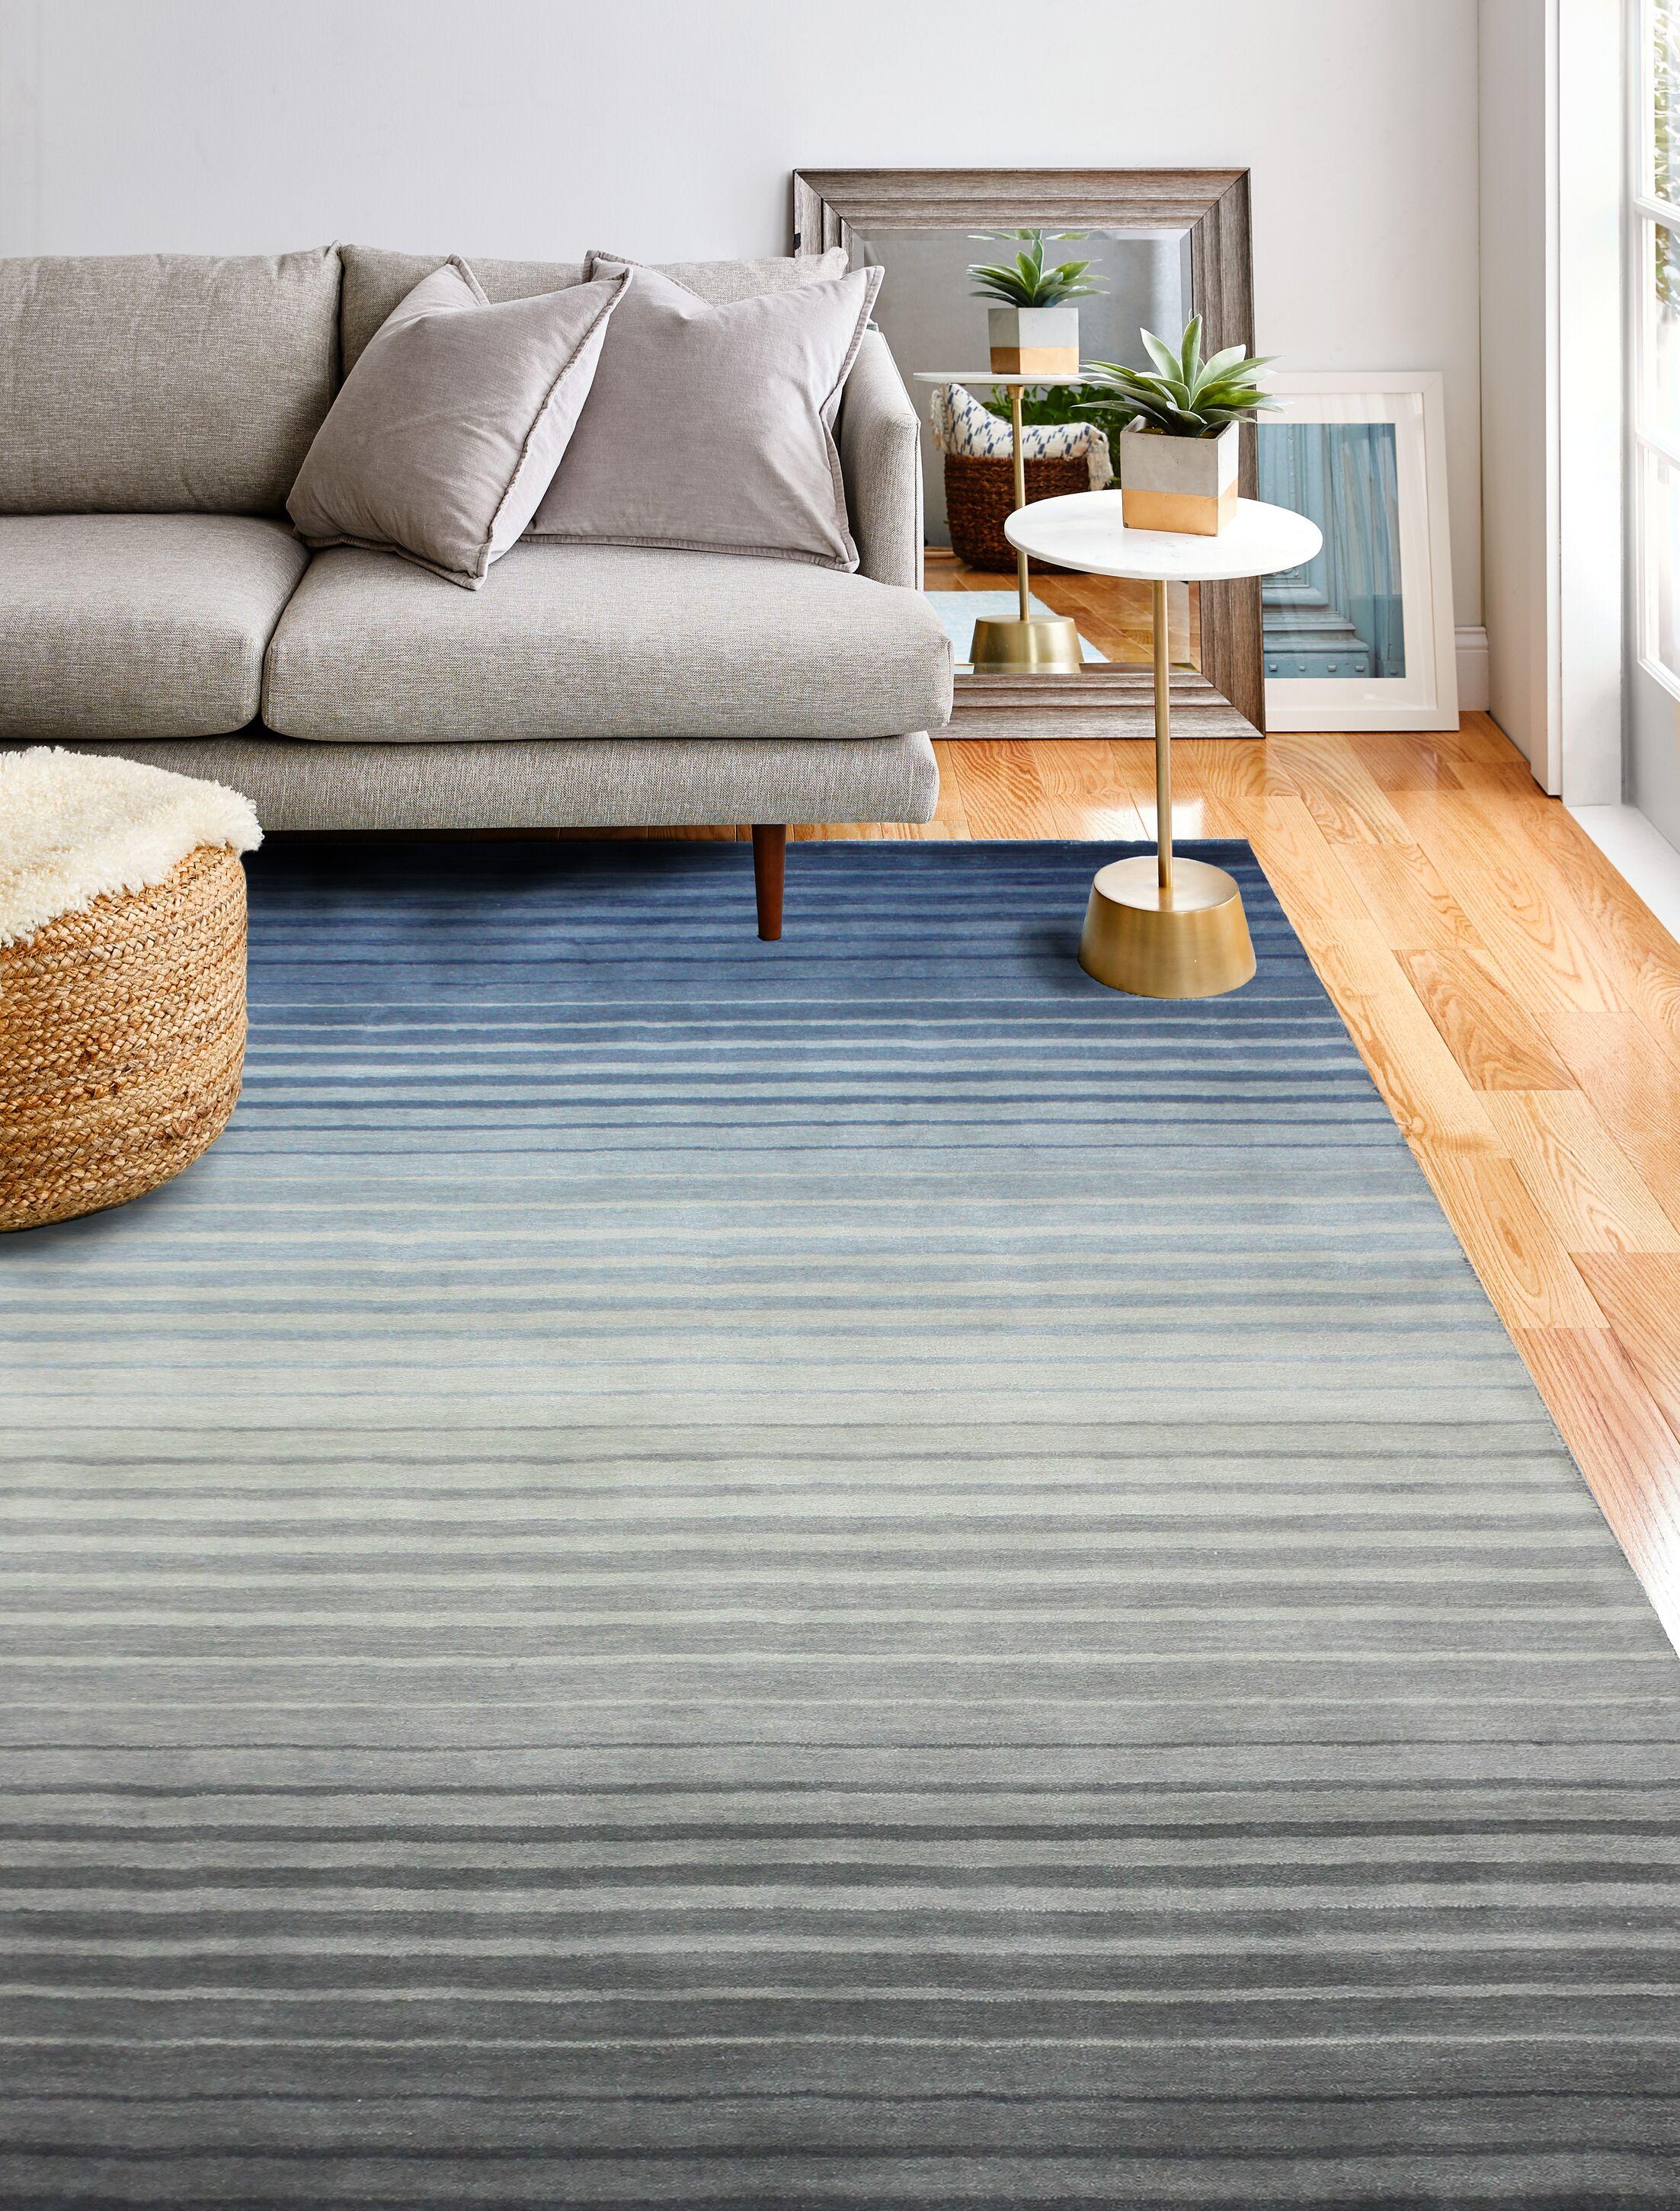 Napoleon Handmade Wool Gray/Blue Area Rug Rug Size: Rectangle 5' x 7'6